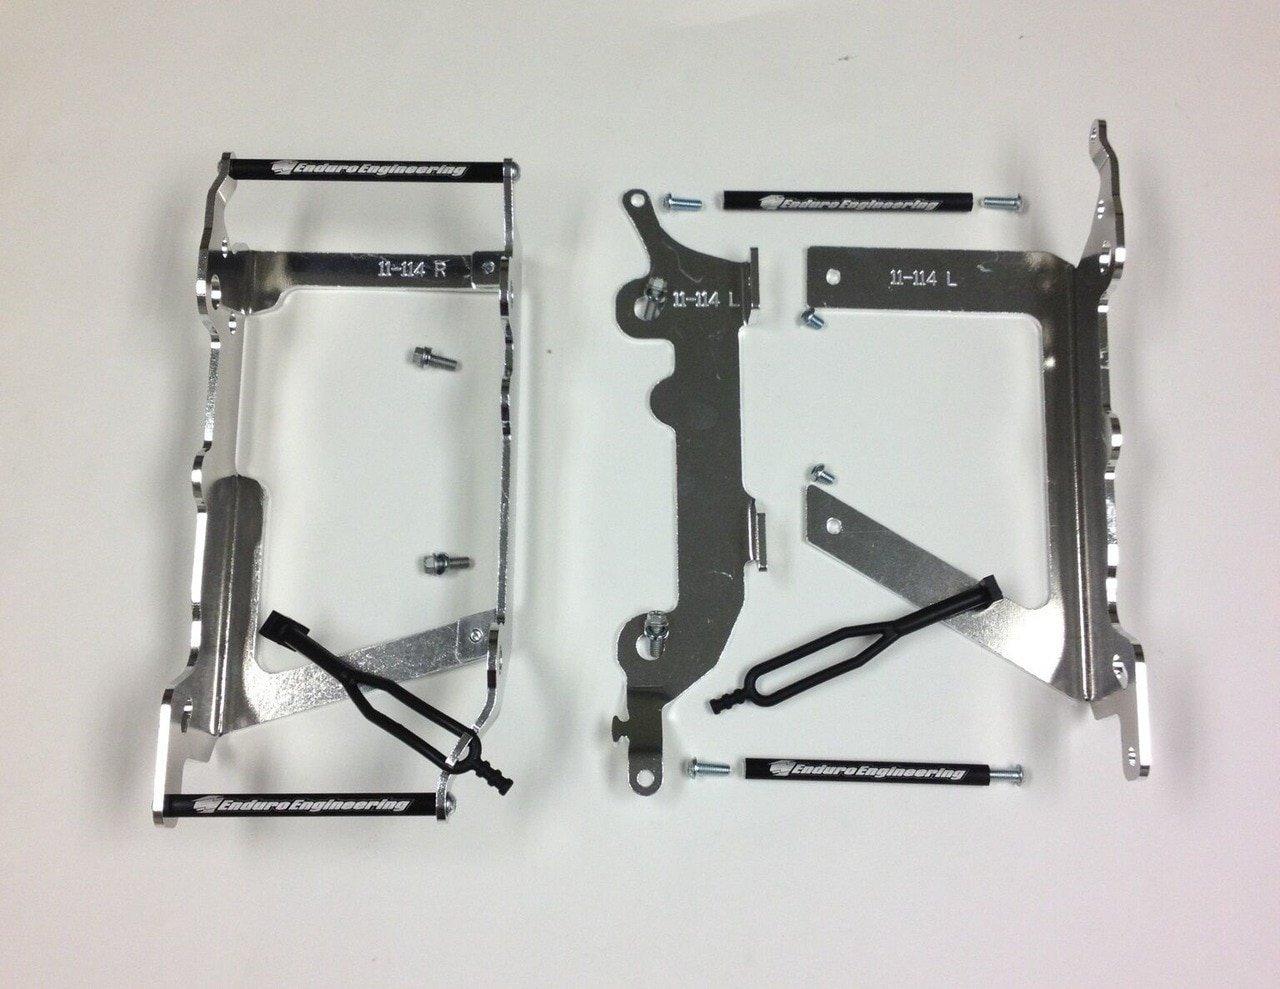 Radiator Braces Fits With Fans KTM Husaberg Husqvarna Enduro Engineering 11-114